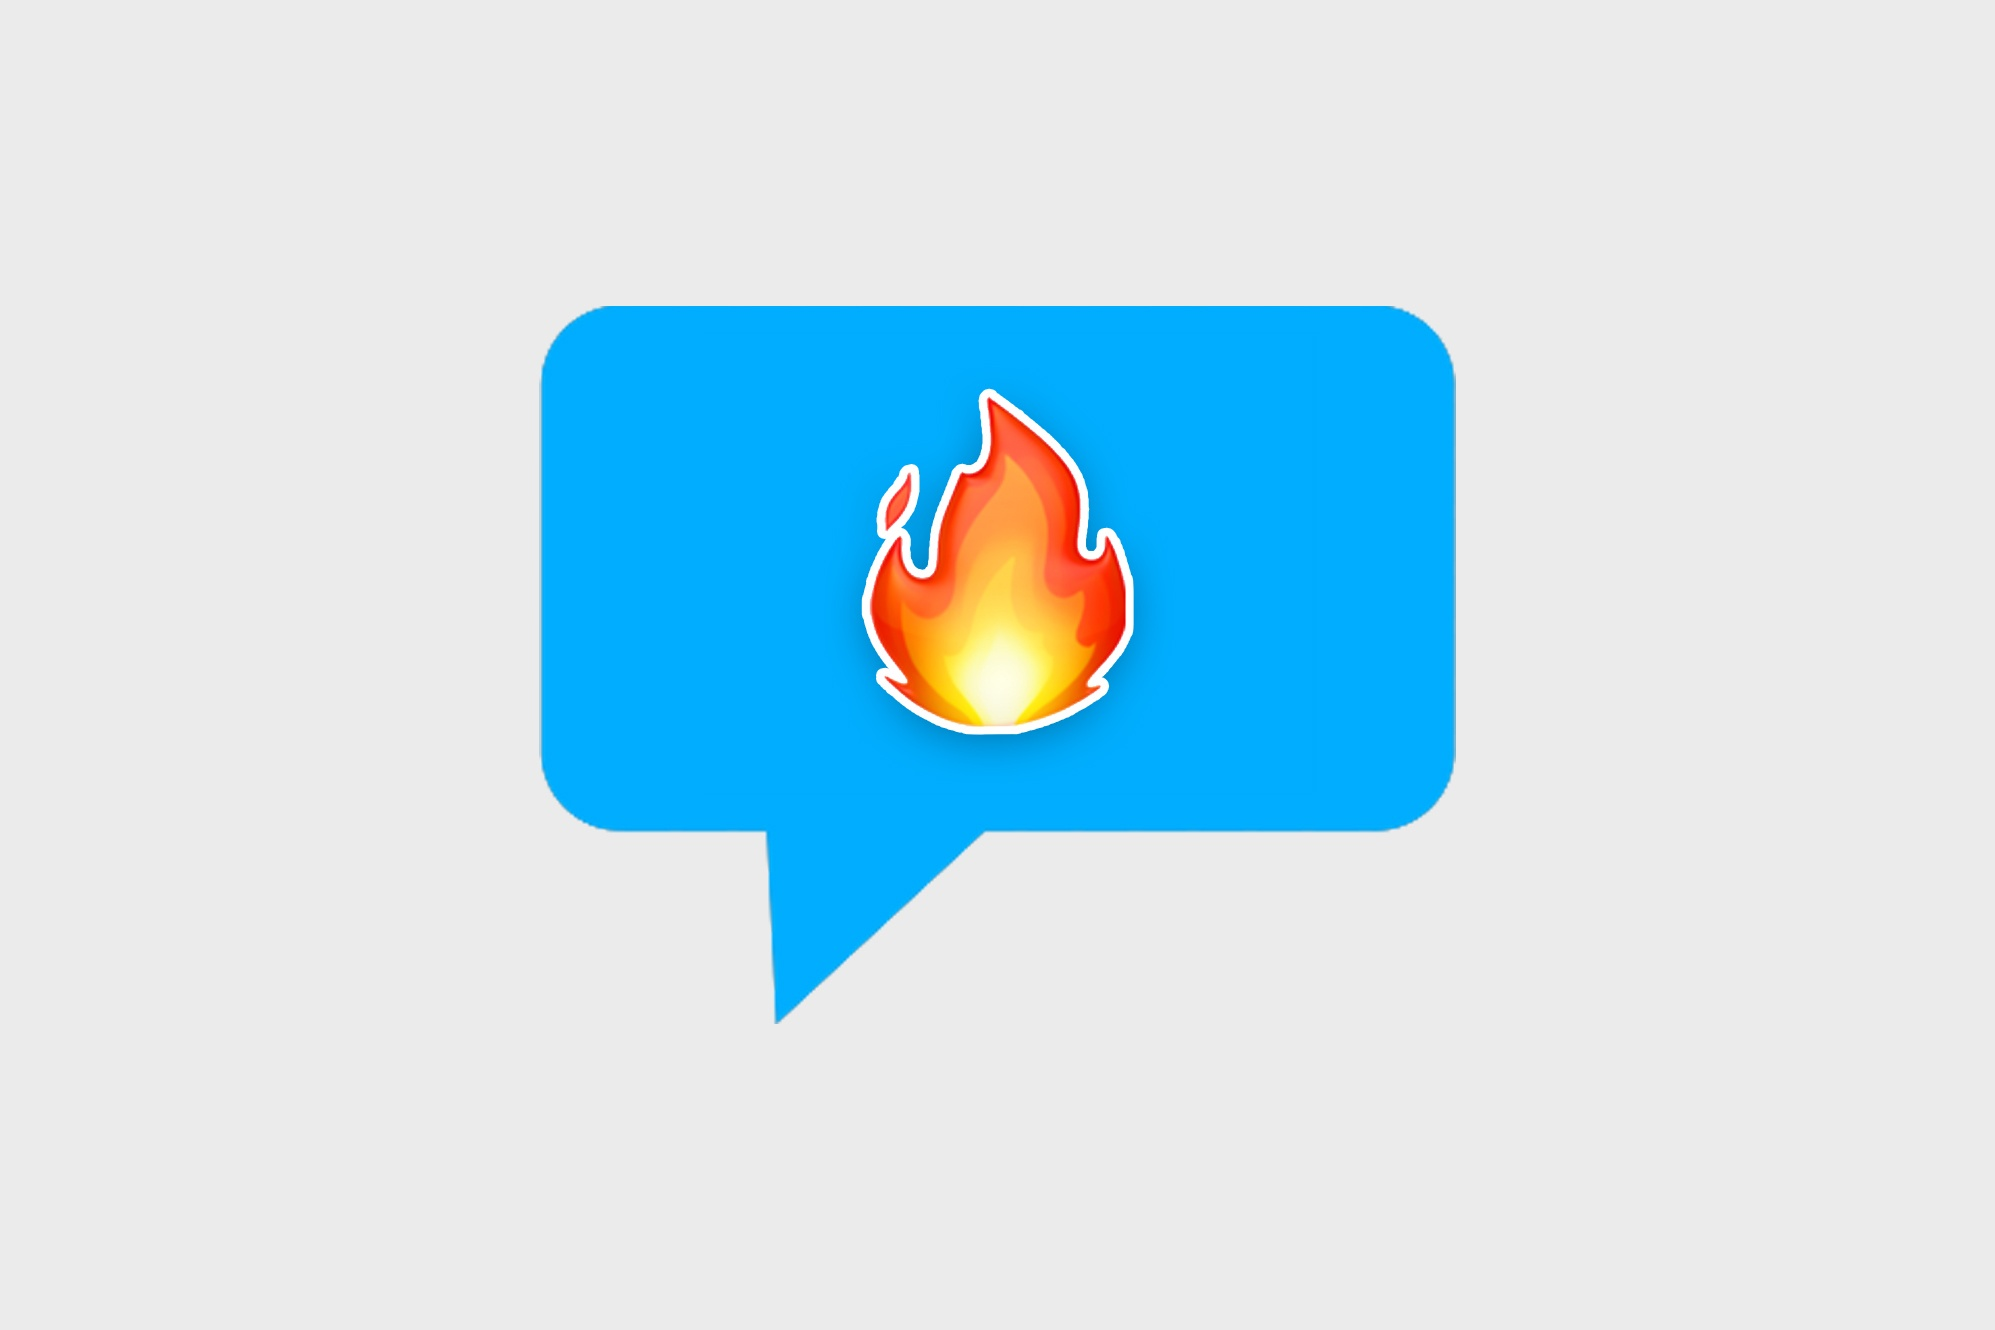 Flame Emoji SextFriend